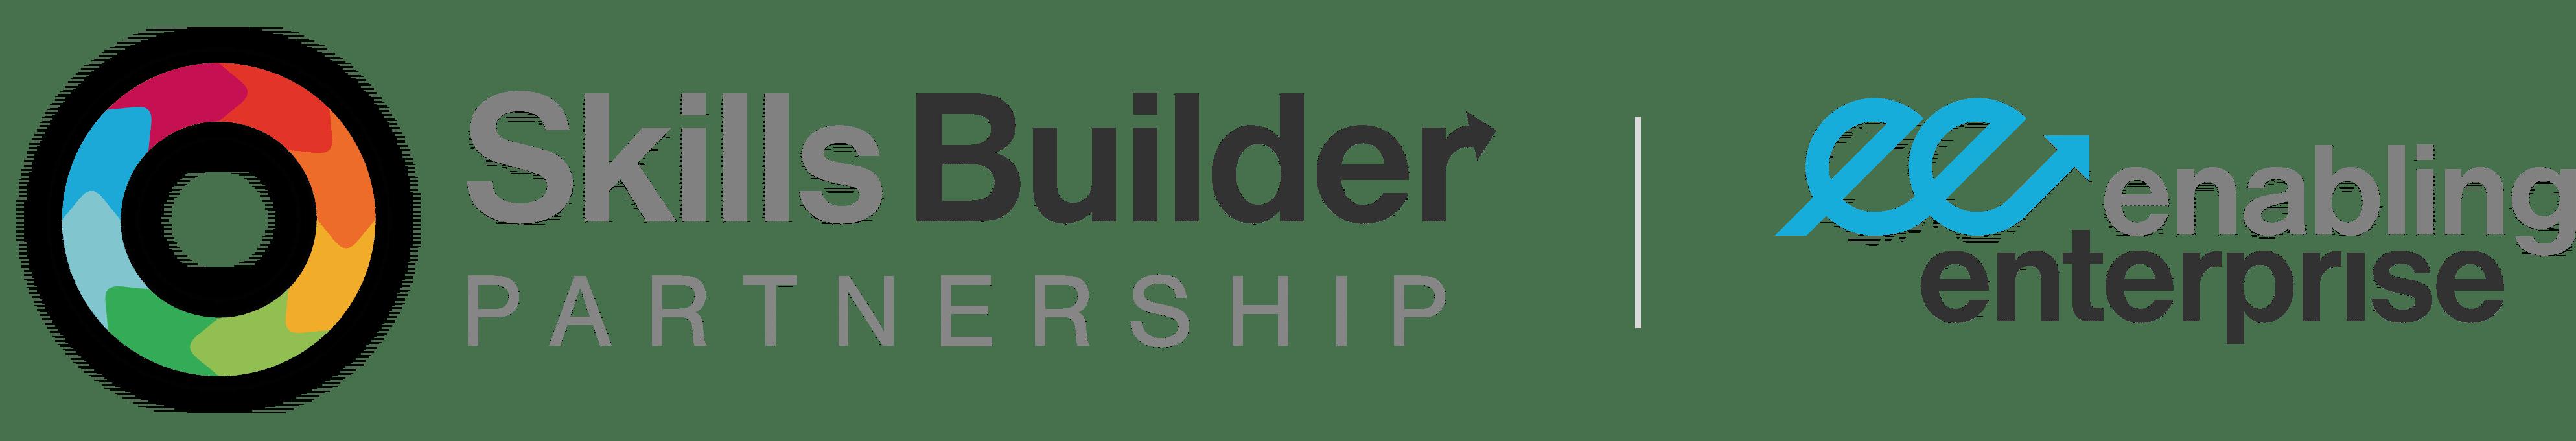 Skills Builder Partnership led by Enabling Enterprise